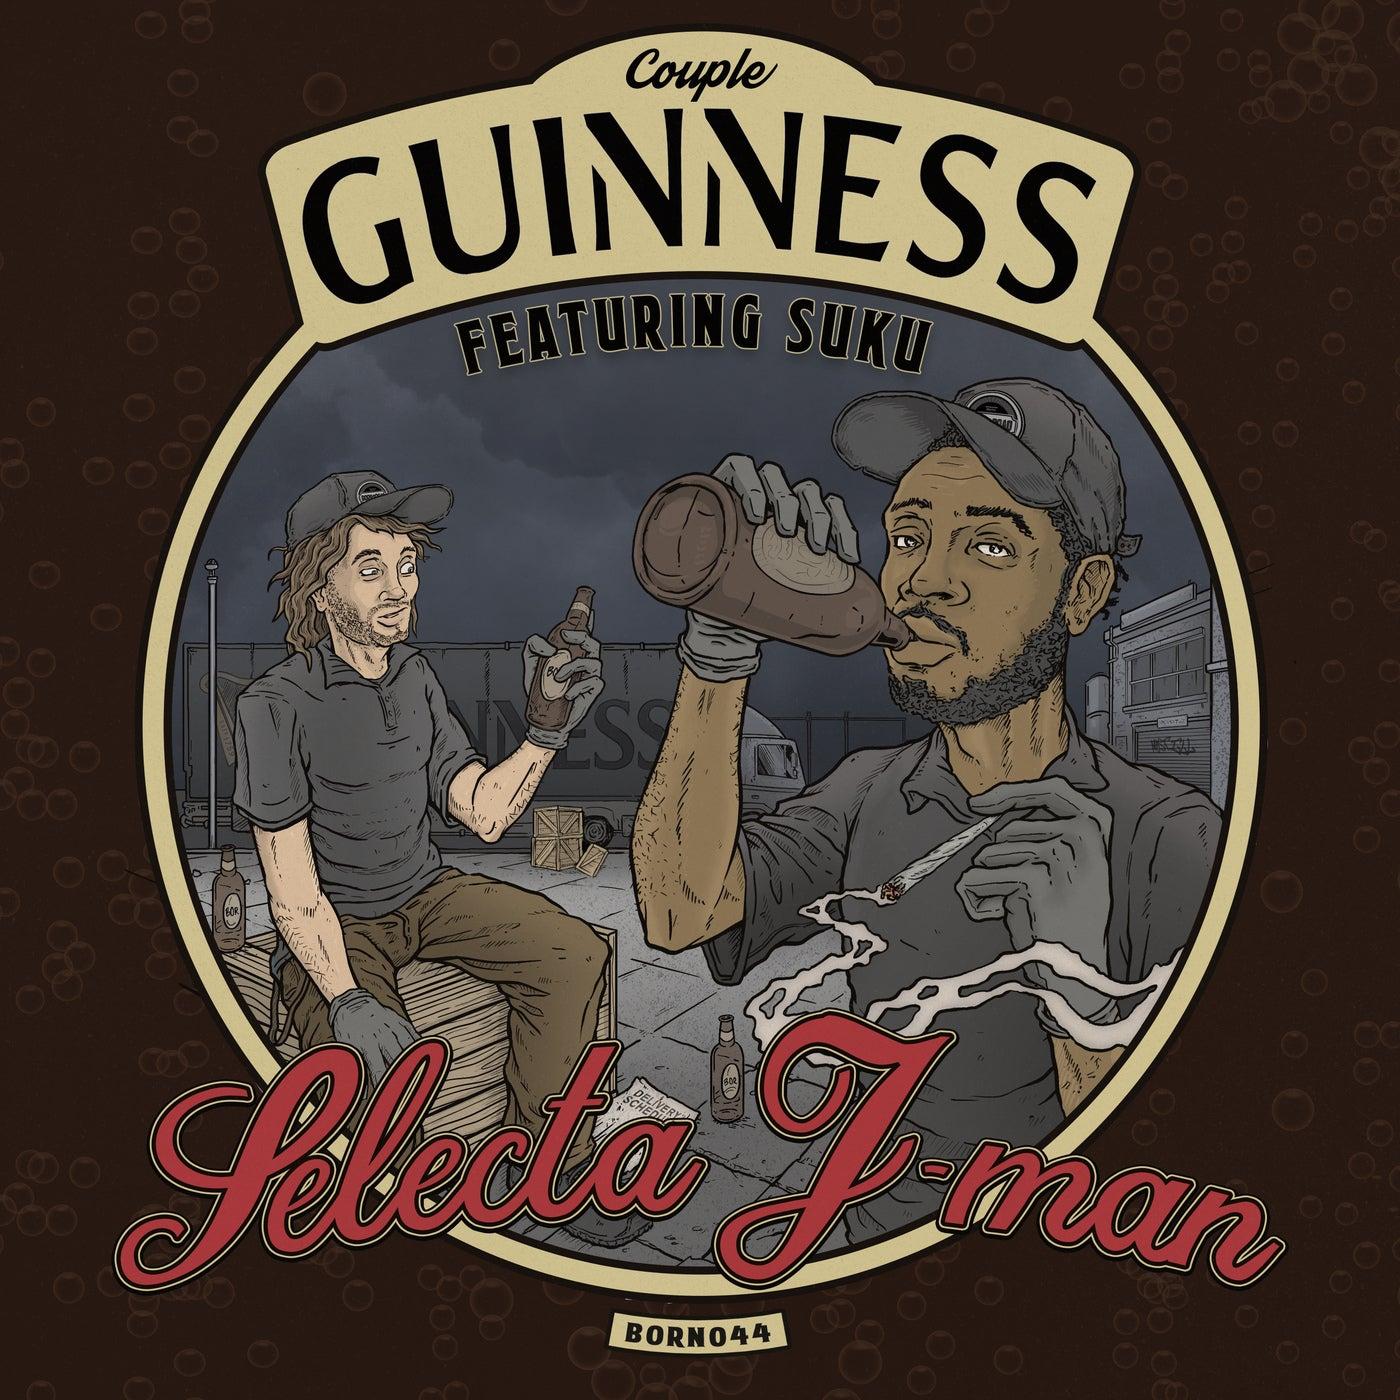 Couple Guinness feat. Suku (Original Mix)